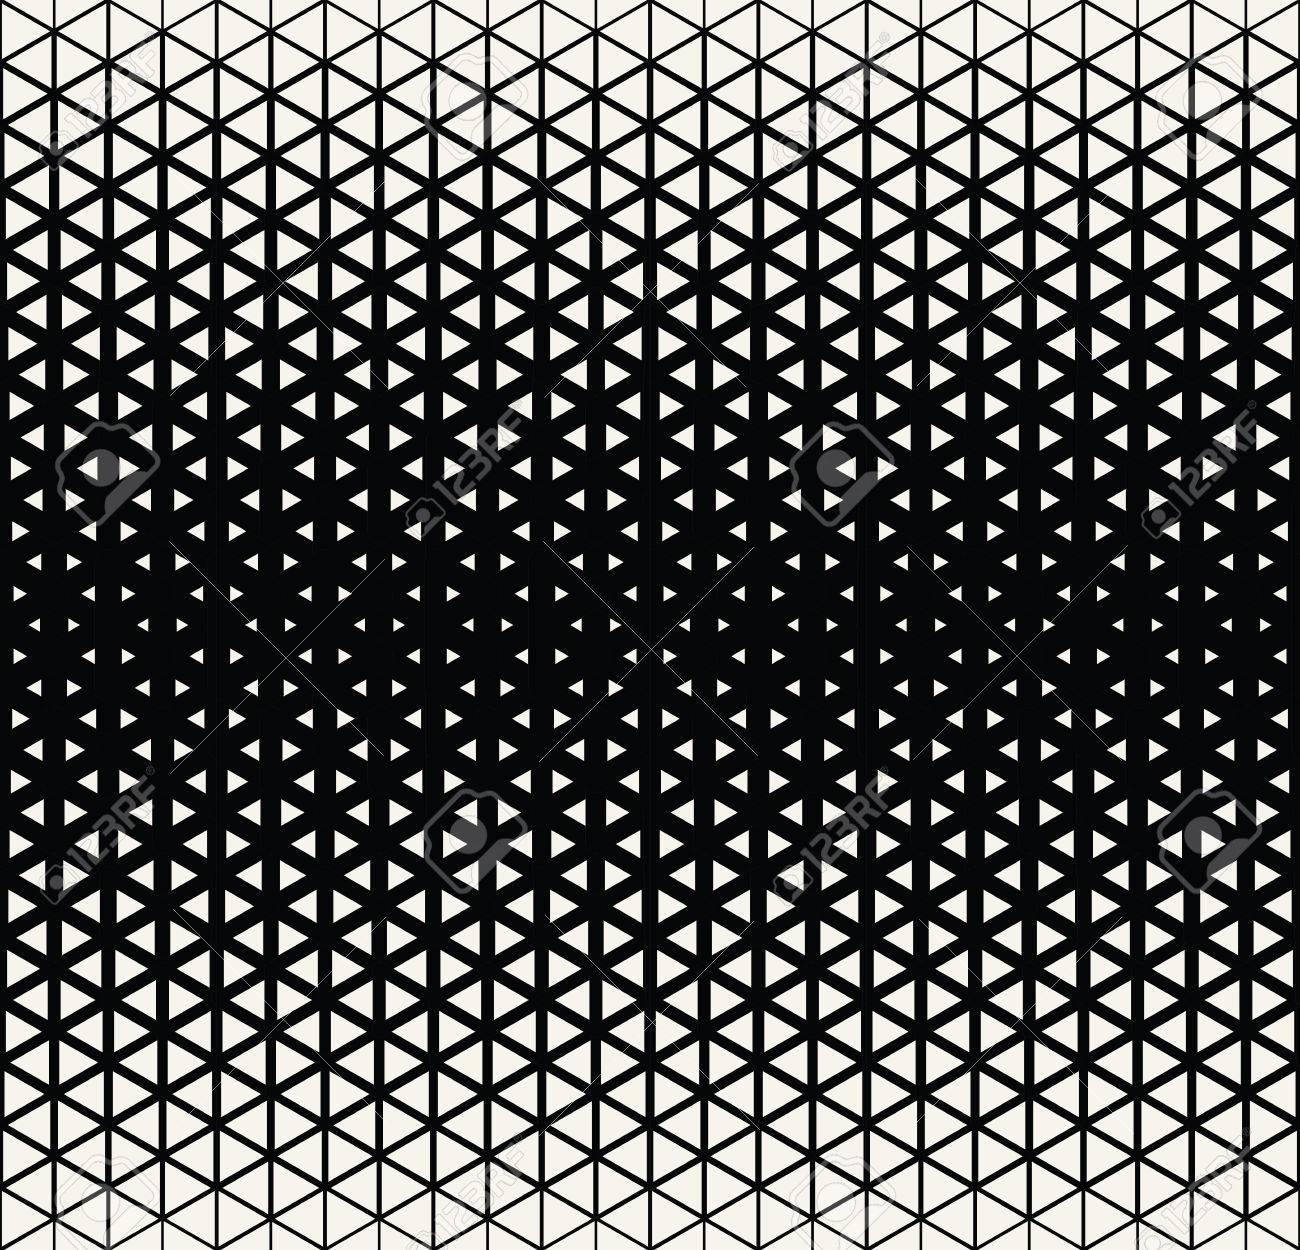 Deco Noir Et Blanc abstract geometric black and white deco art halftone hexagone..